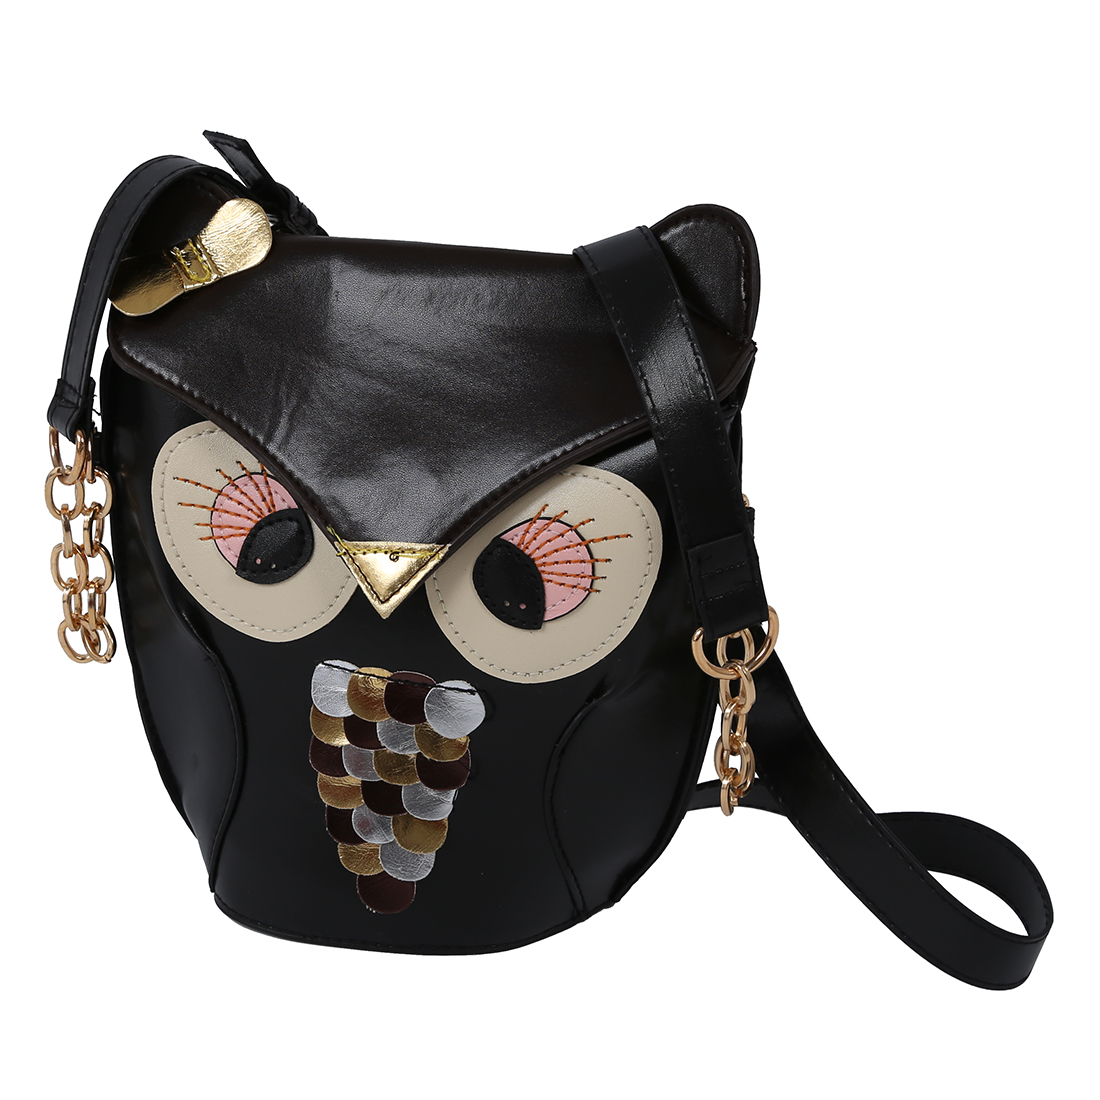 5pcs( ABDB-Ladies Fashion Adjustable Owl Pattern Chain Shoulder Bag